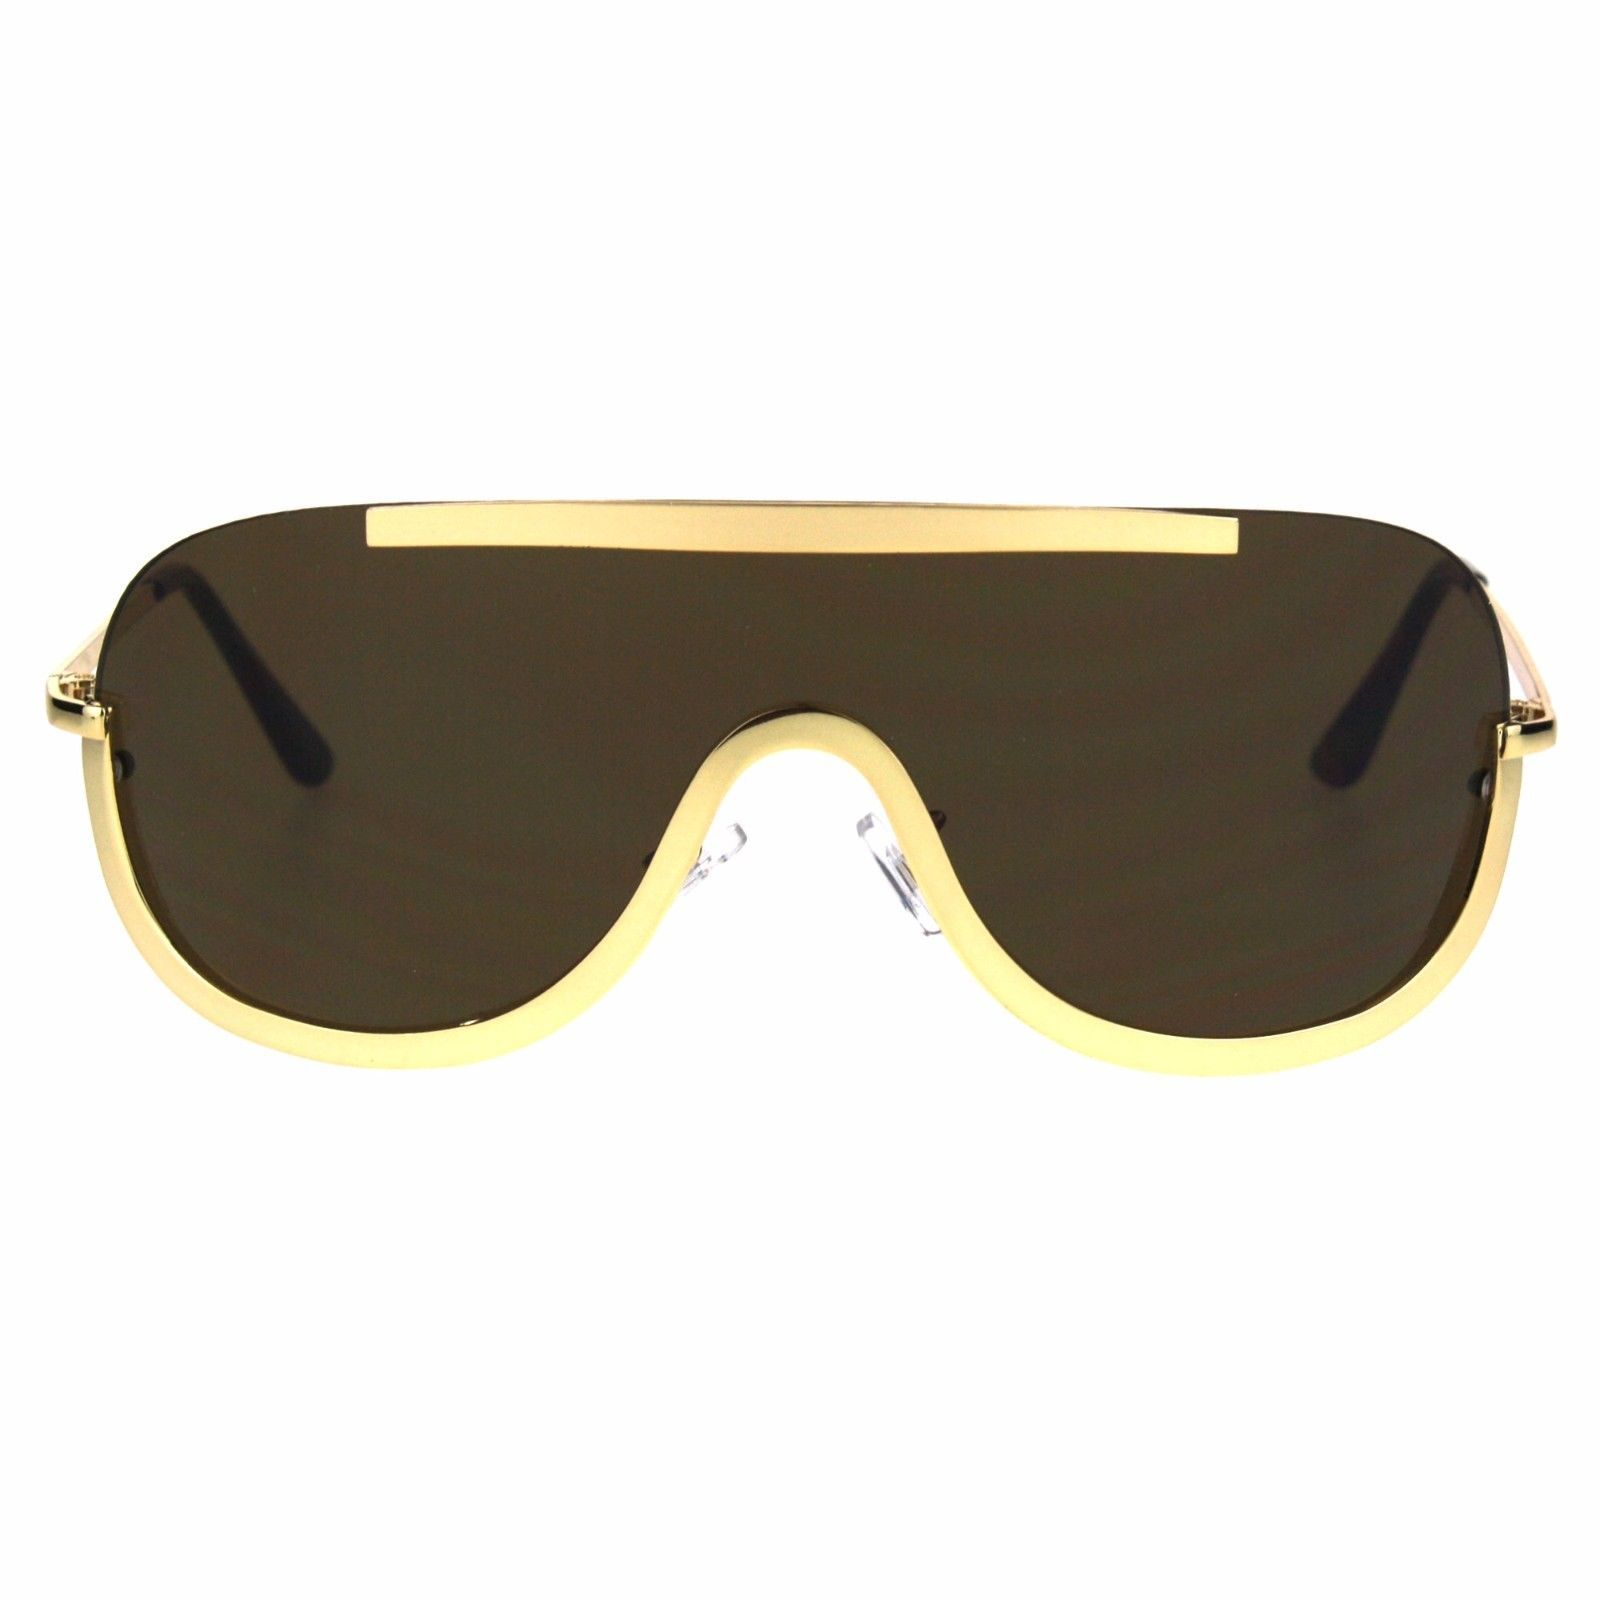 Retro Modern Fashion Sunglasses Unisex Oversized Shield Frame UV 400